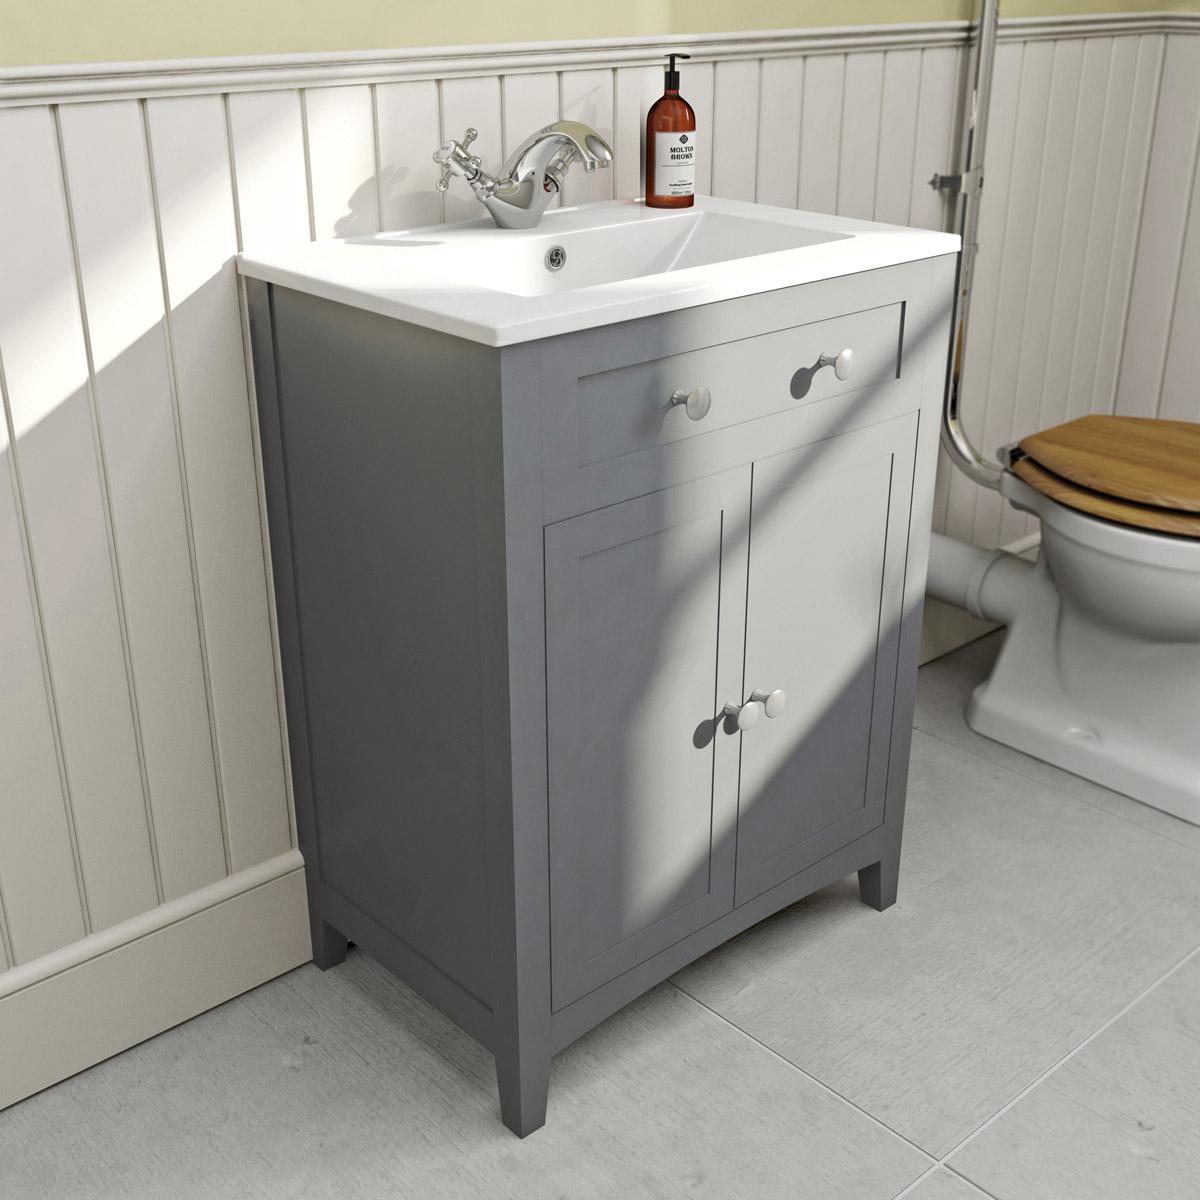 vanity unit with basin floorstanding vanity units DVTMCFQ